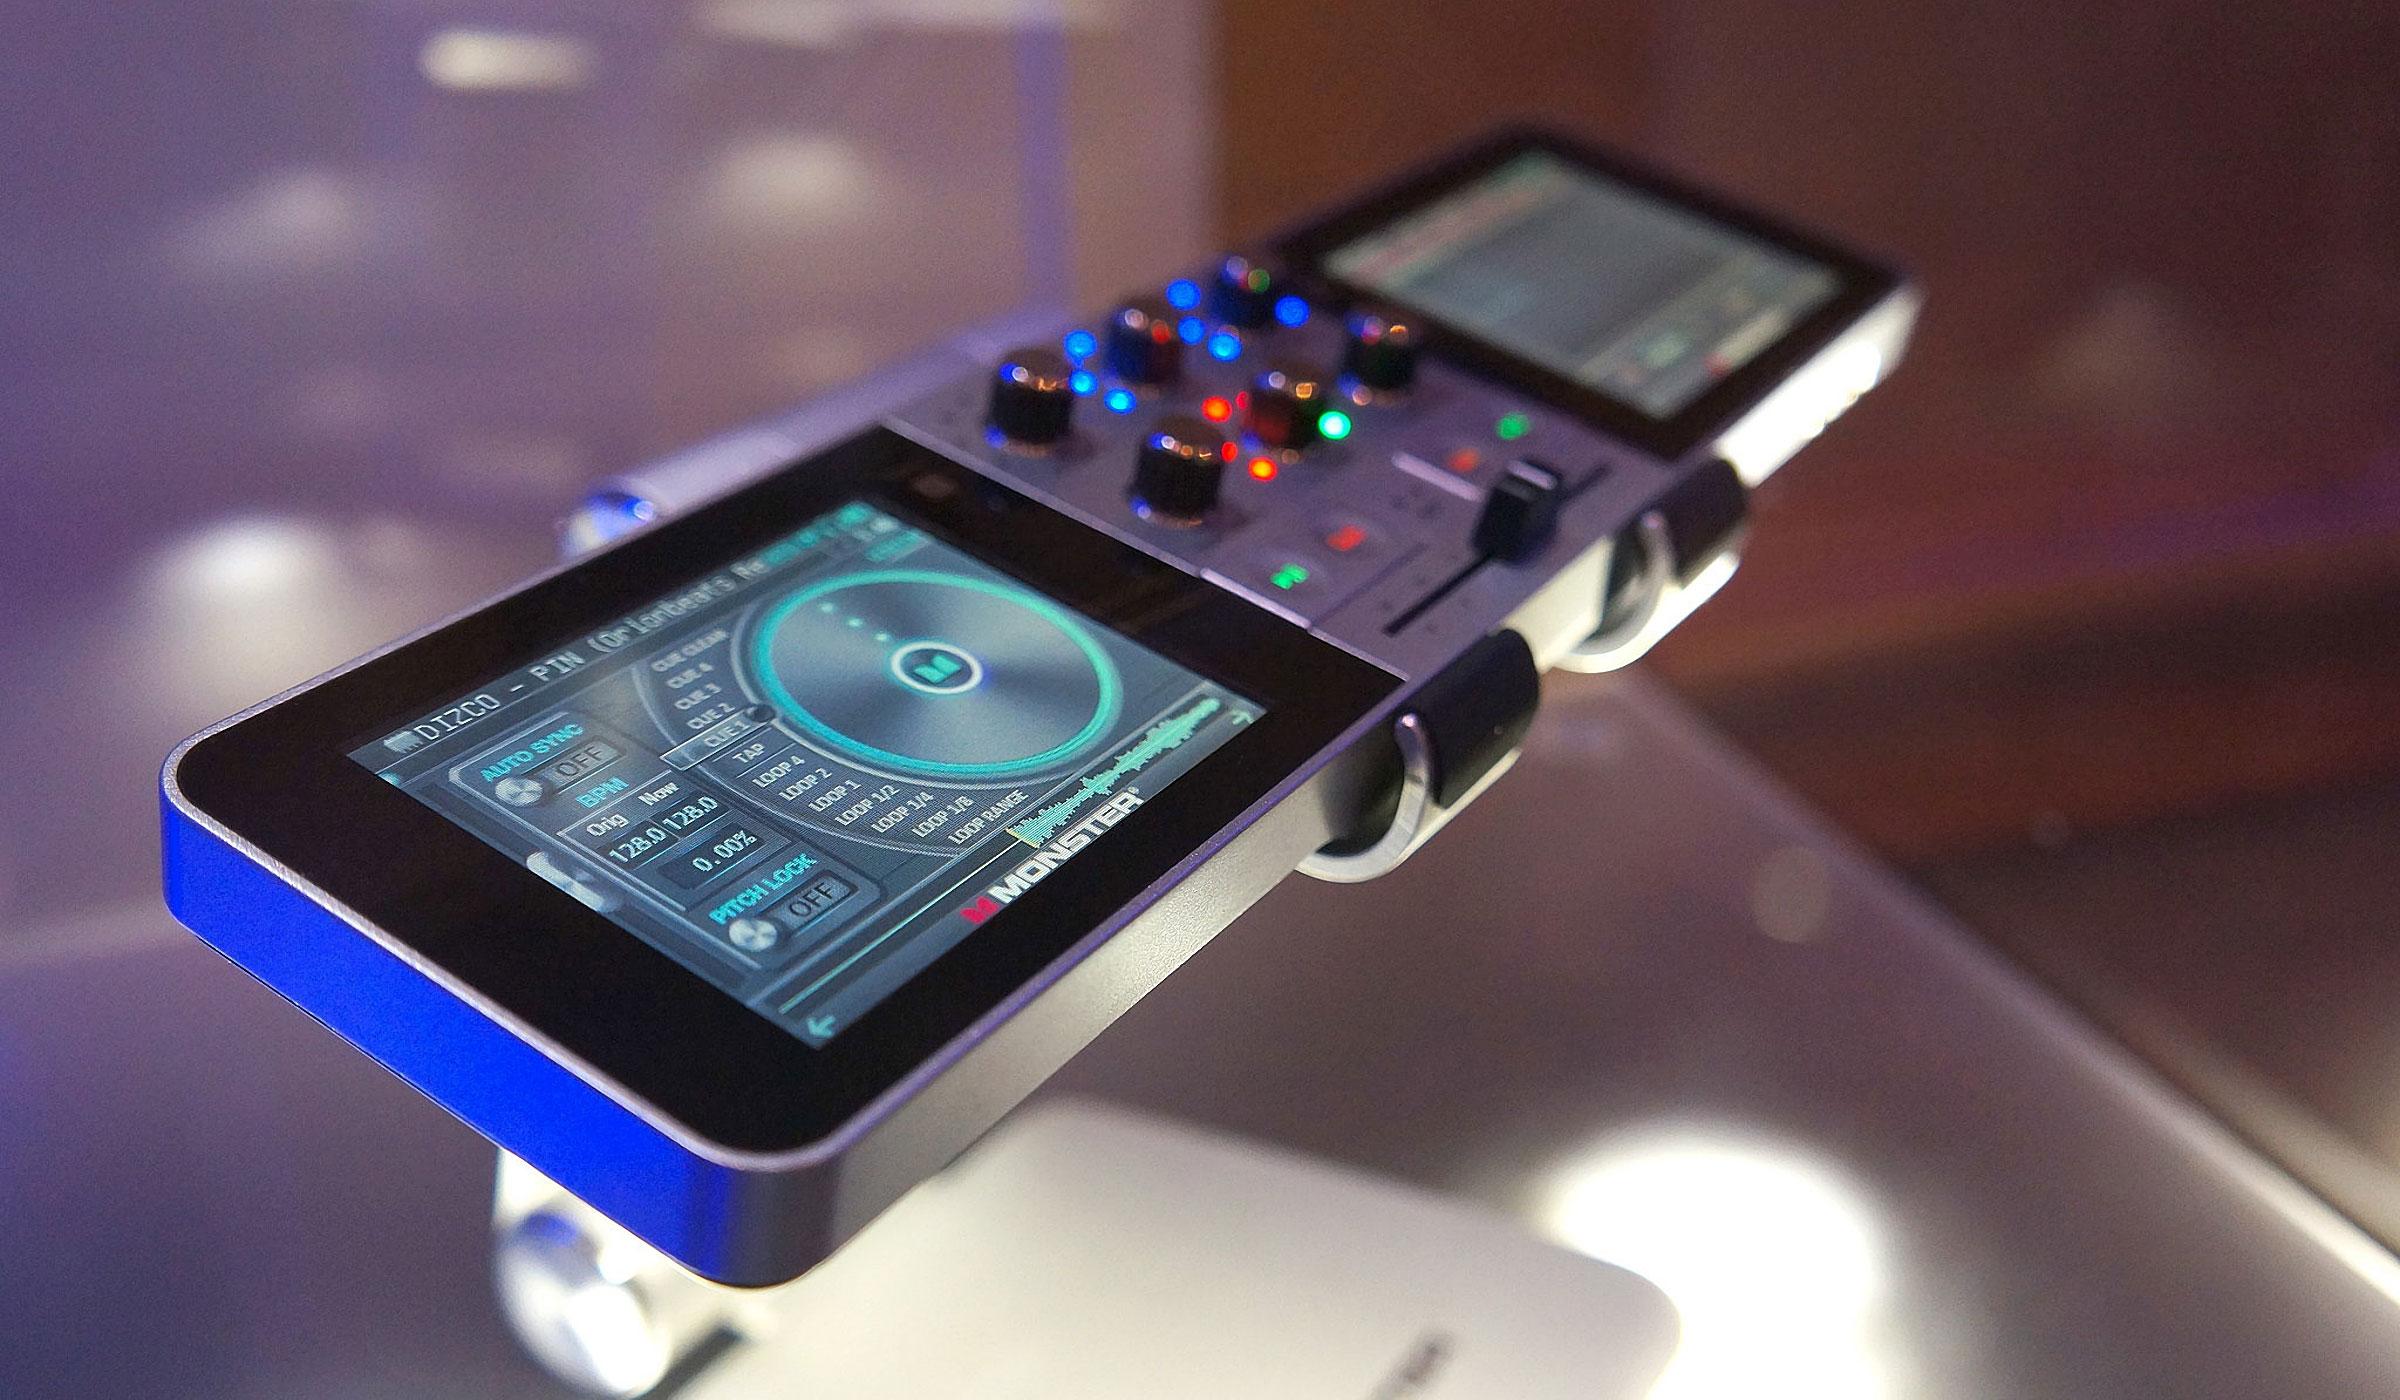 MONSTER GO DJ PORTABLE MIXER DIGITAL TURNTABLE